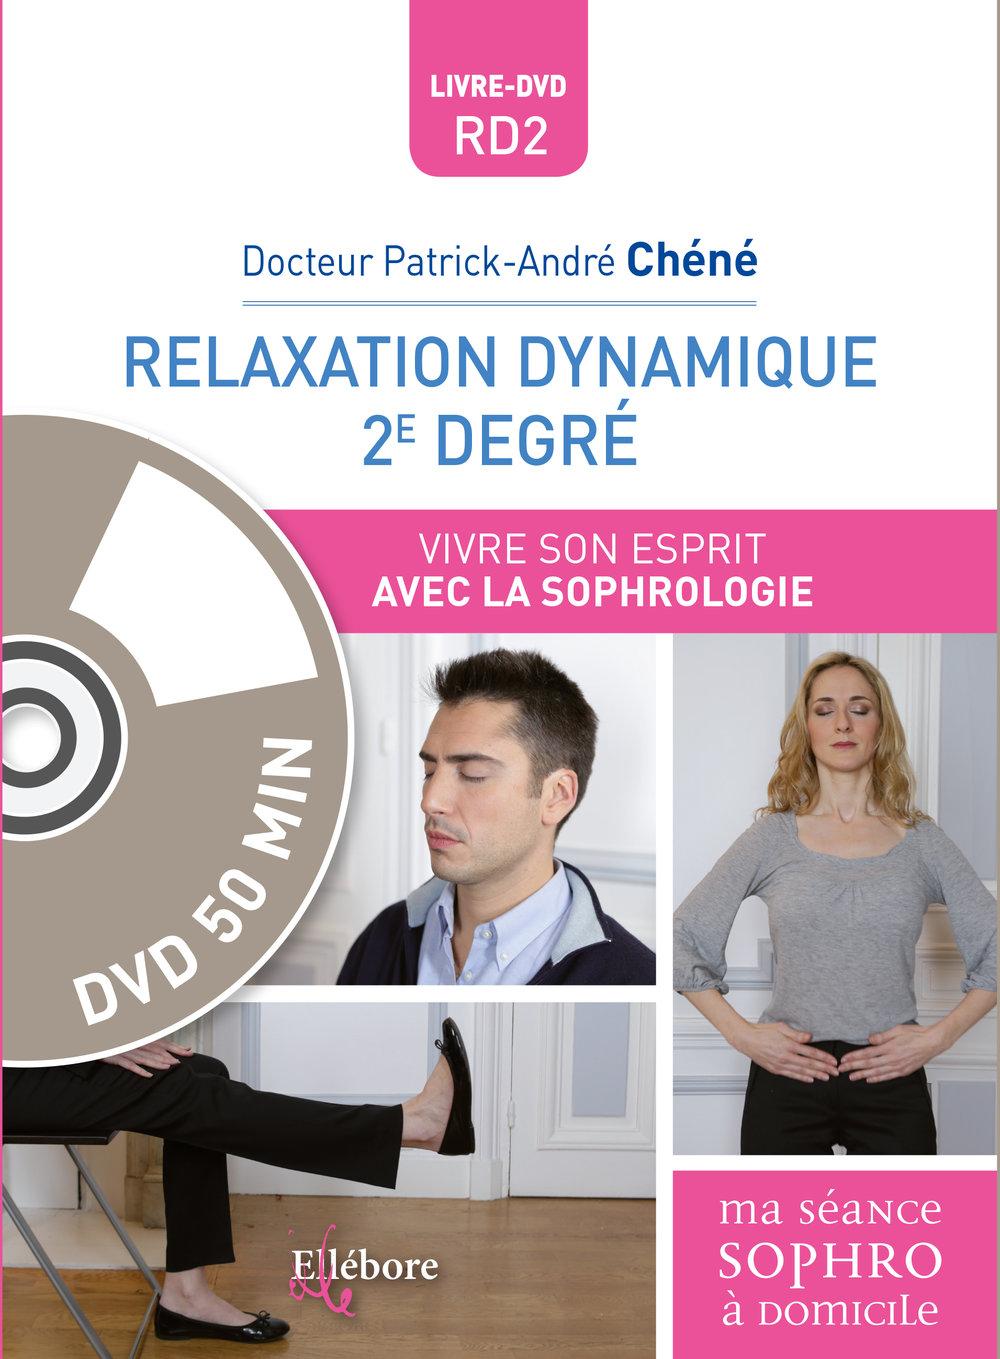 ralaxationdynamique2edegre.jpg